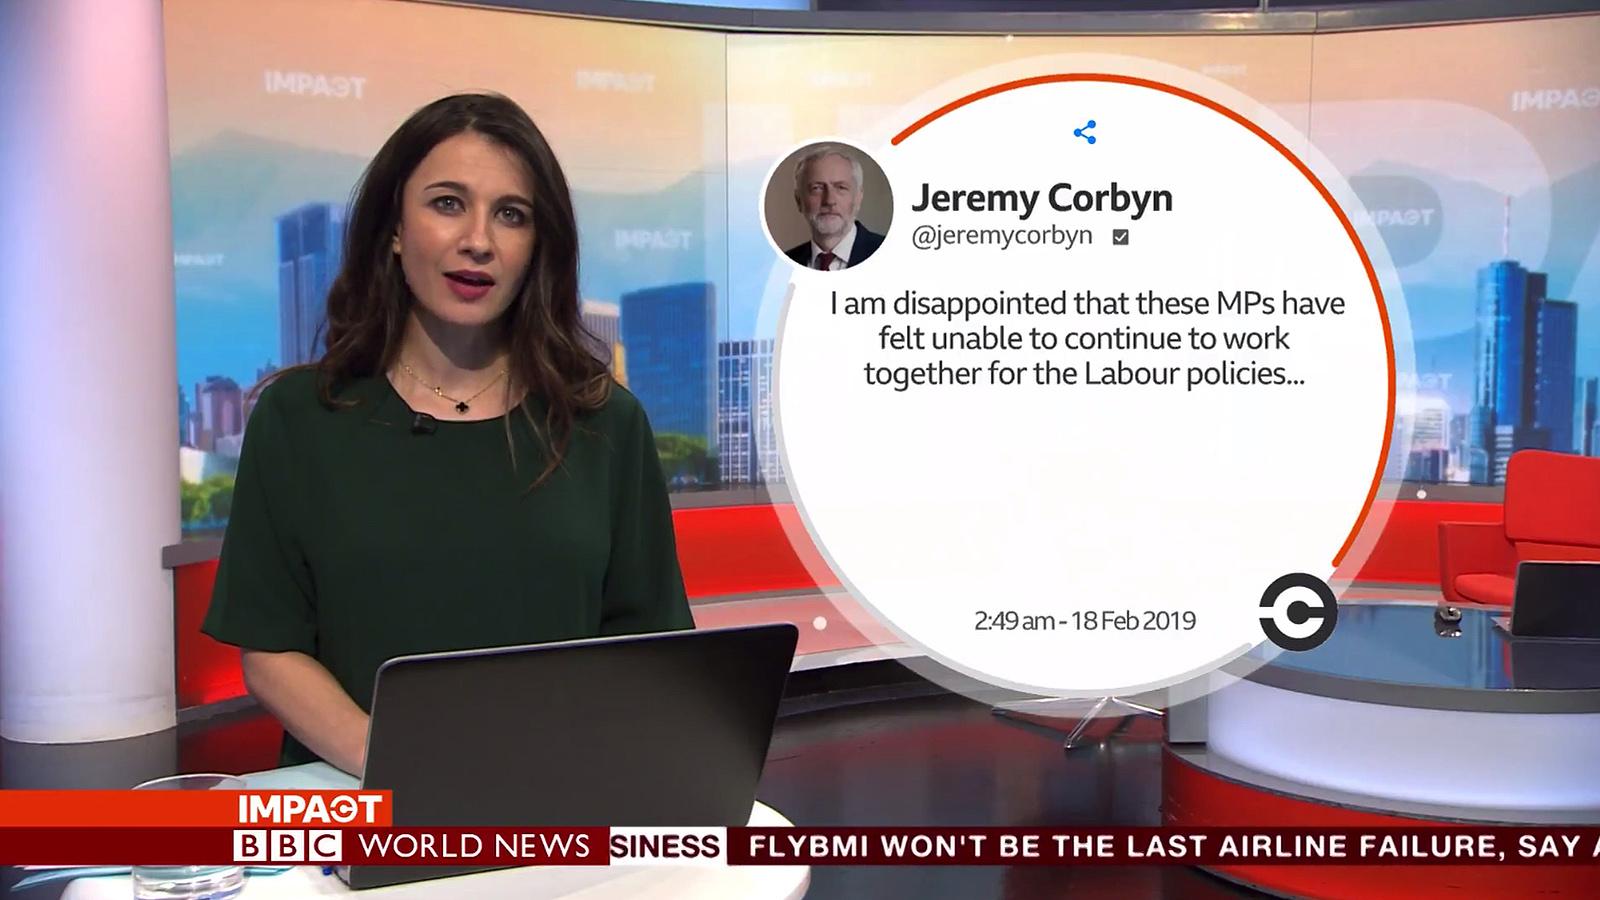 NCS_BBC-World-News_Impact_013